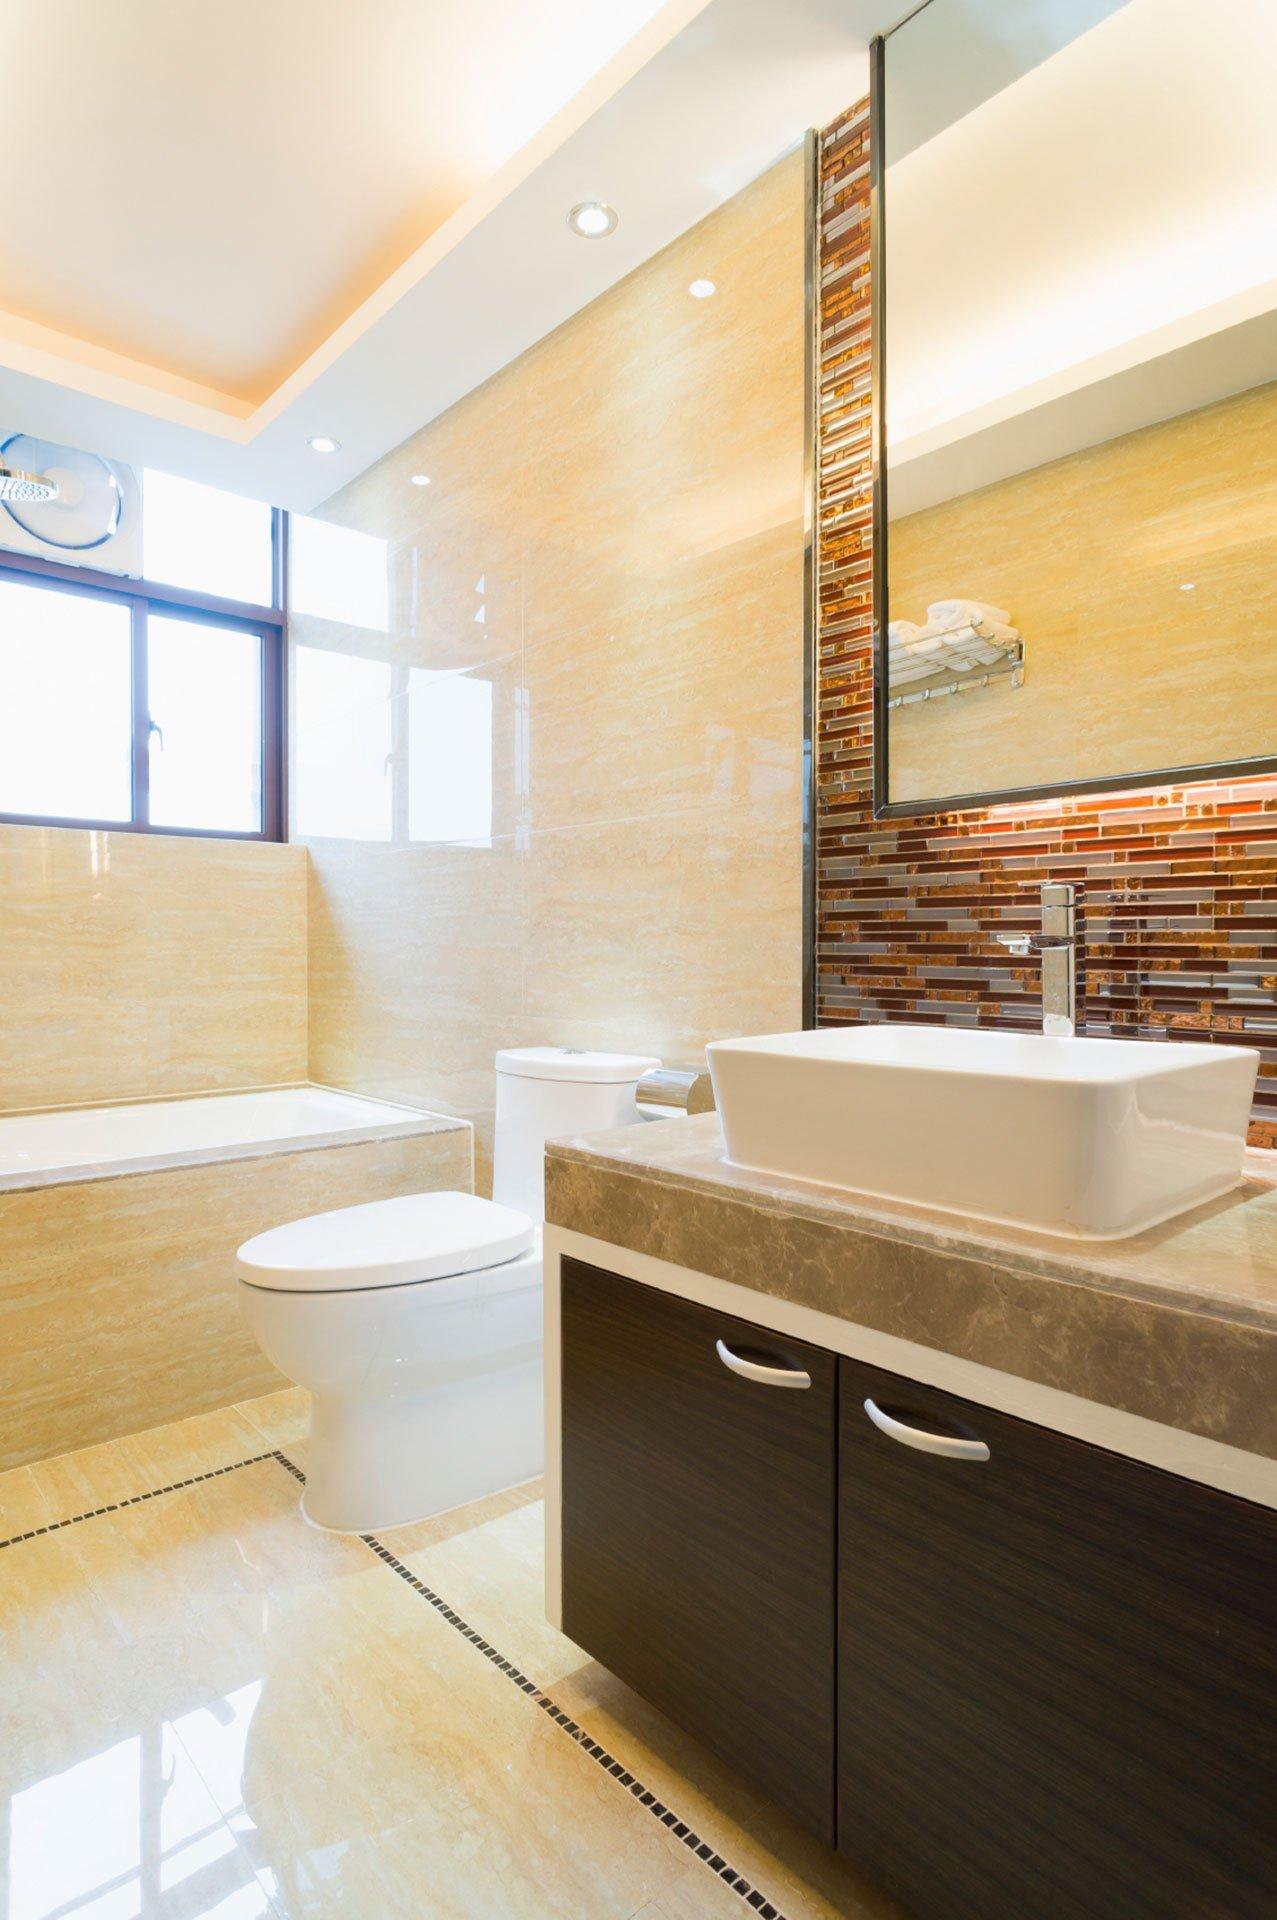 Bathroom Remodeling Clifton Park NY Albany amp Schenectady NY. Bathroom Remodeling Albany Ny